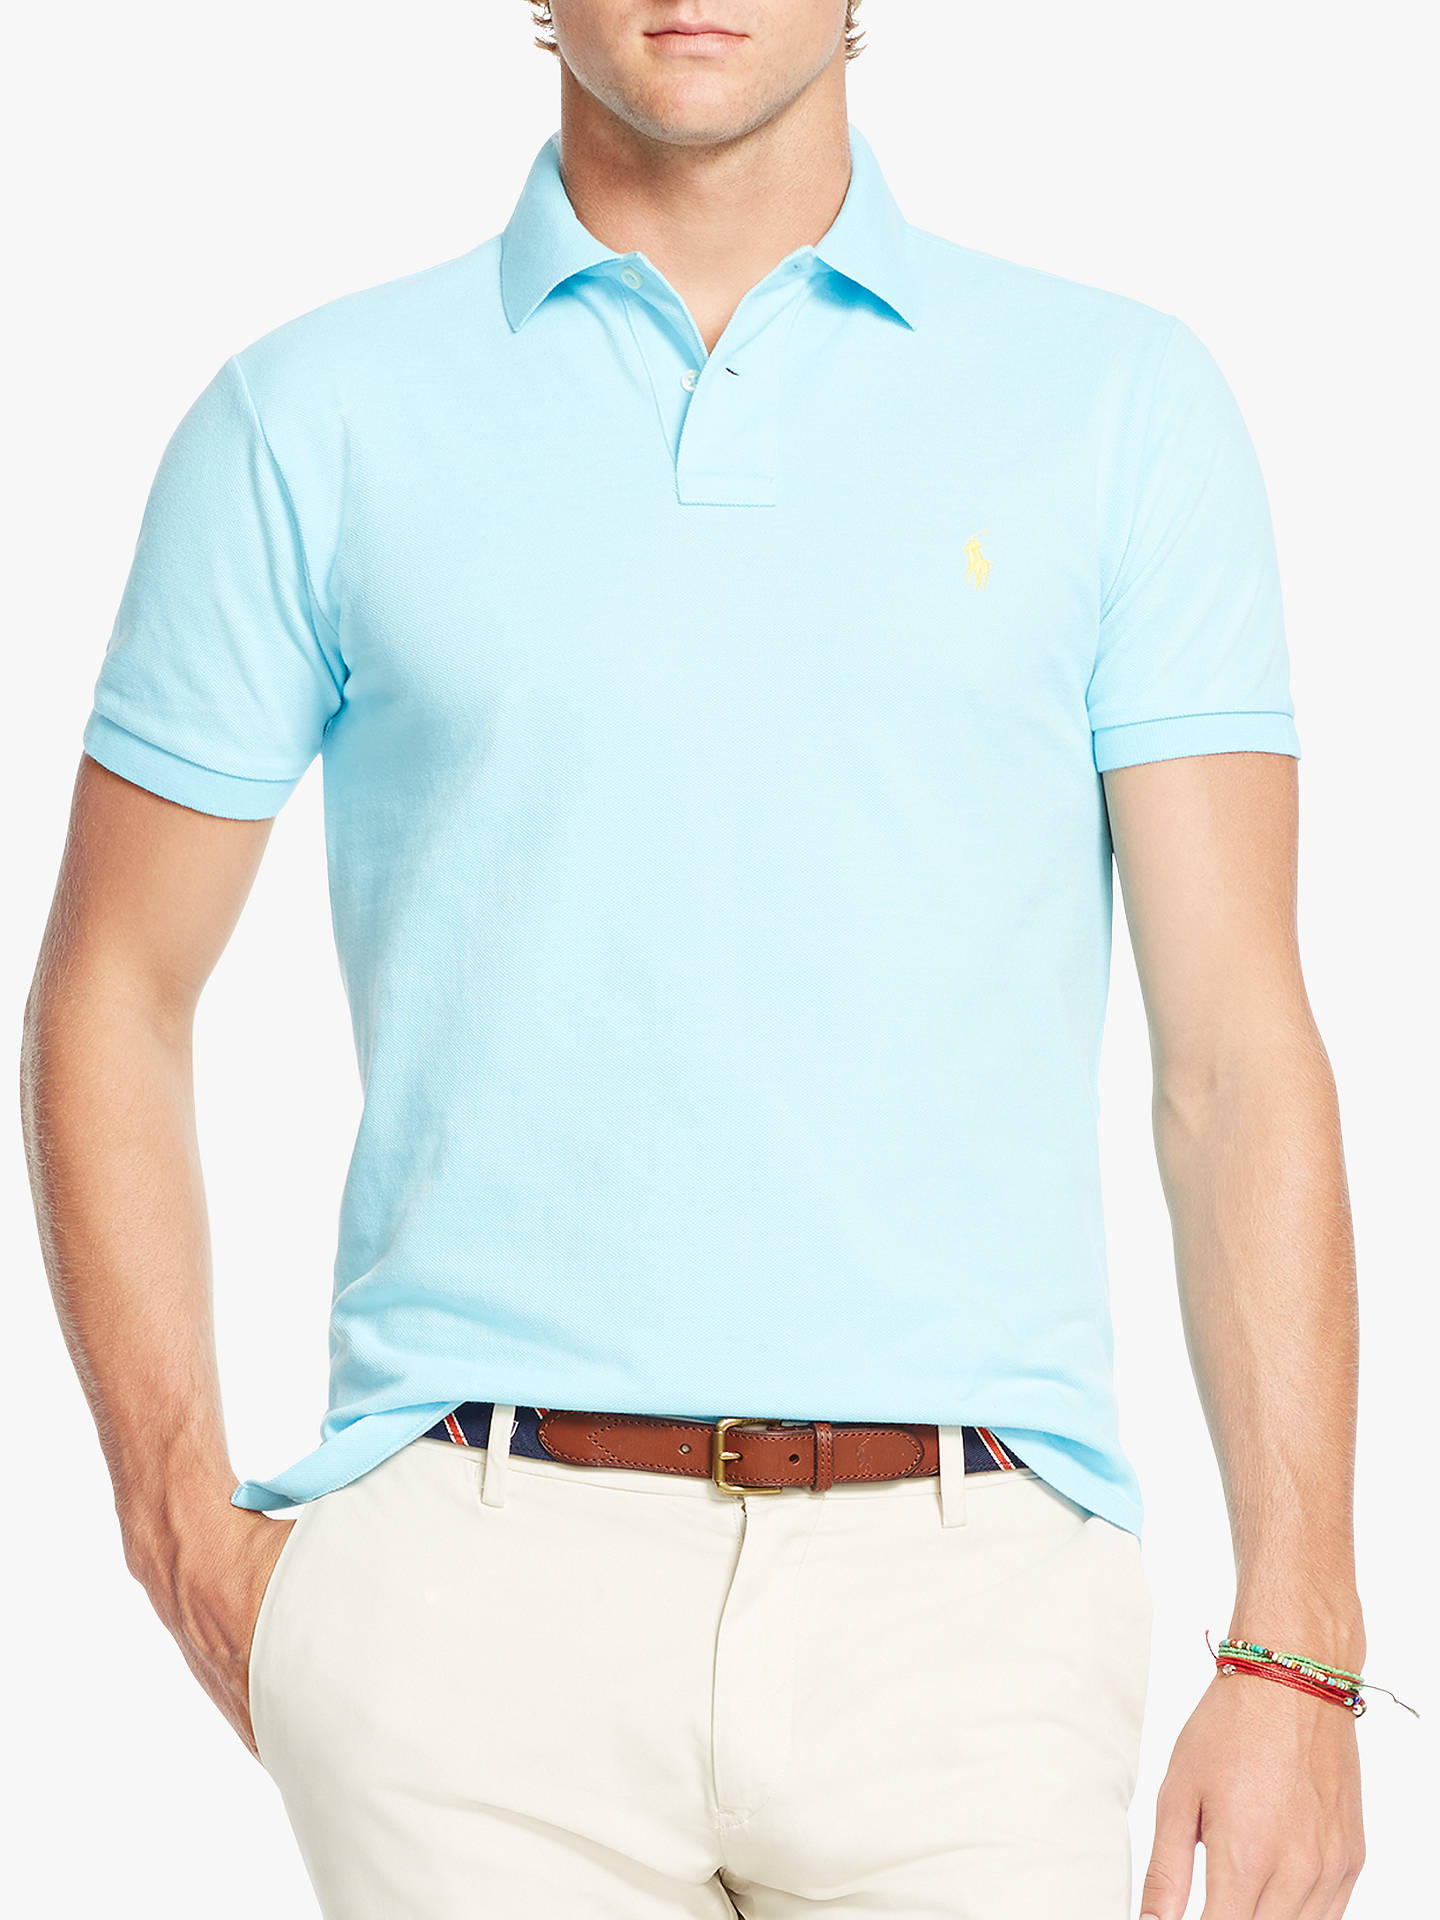 Ralph Lauren Polo Classic Fit Mesh Polo Shirt Teal-Beige-Blue Lot of 3 Sz XXL